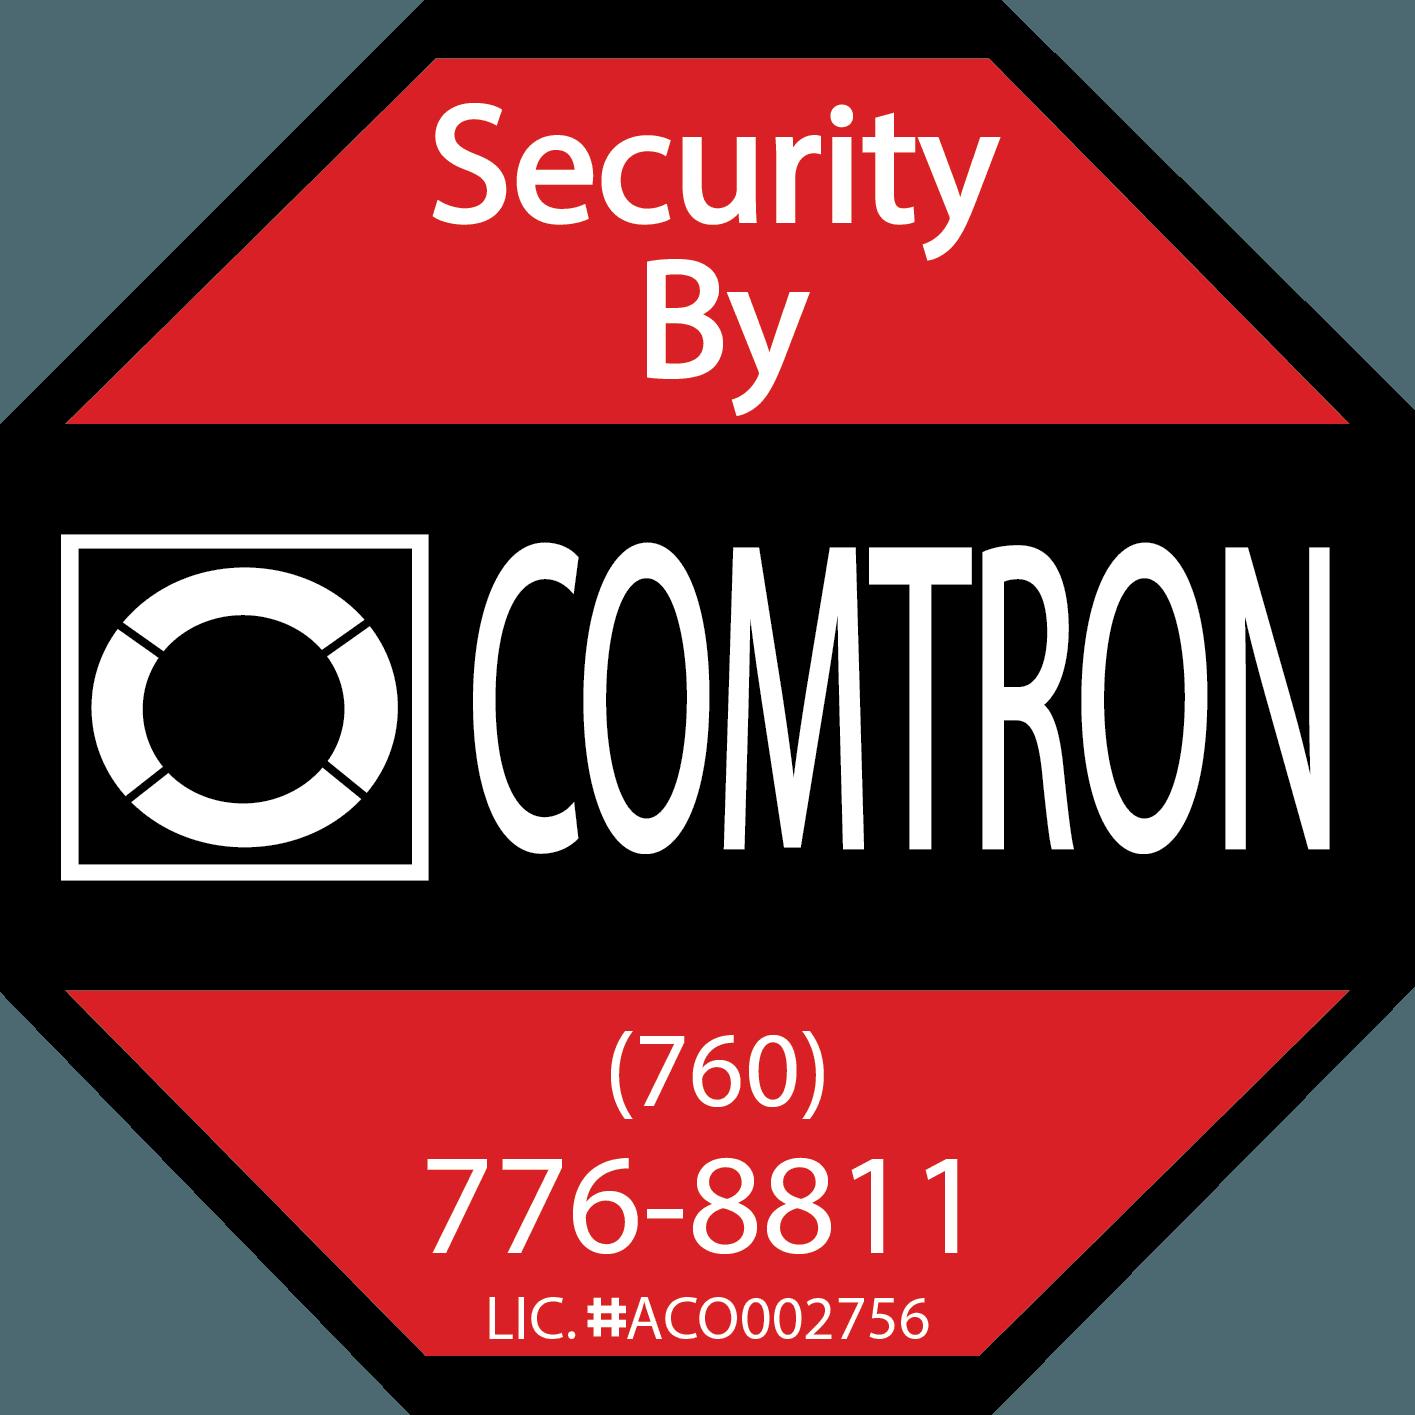 Comtron Systems